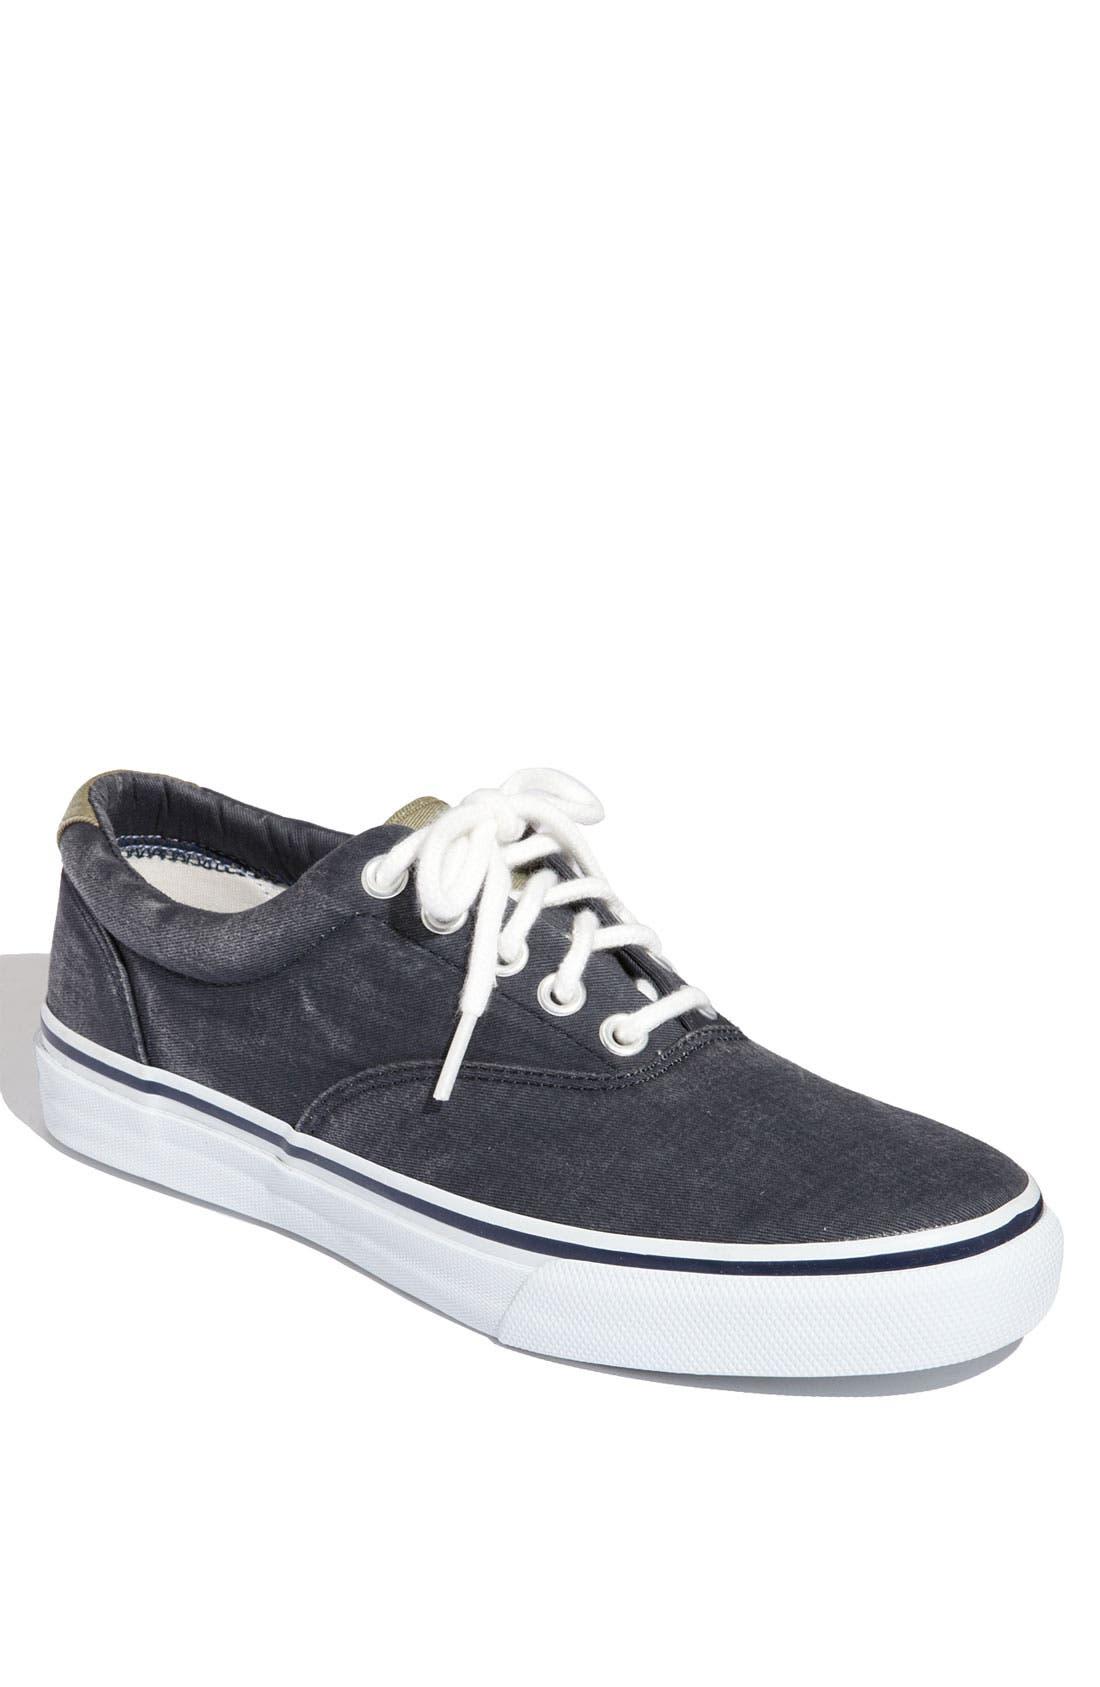 Alternate Image 1 Selected - Sperry Top-Sider® 'Striper' Sneaker (Men)